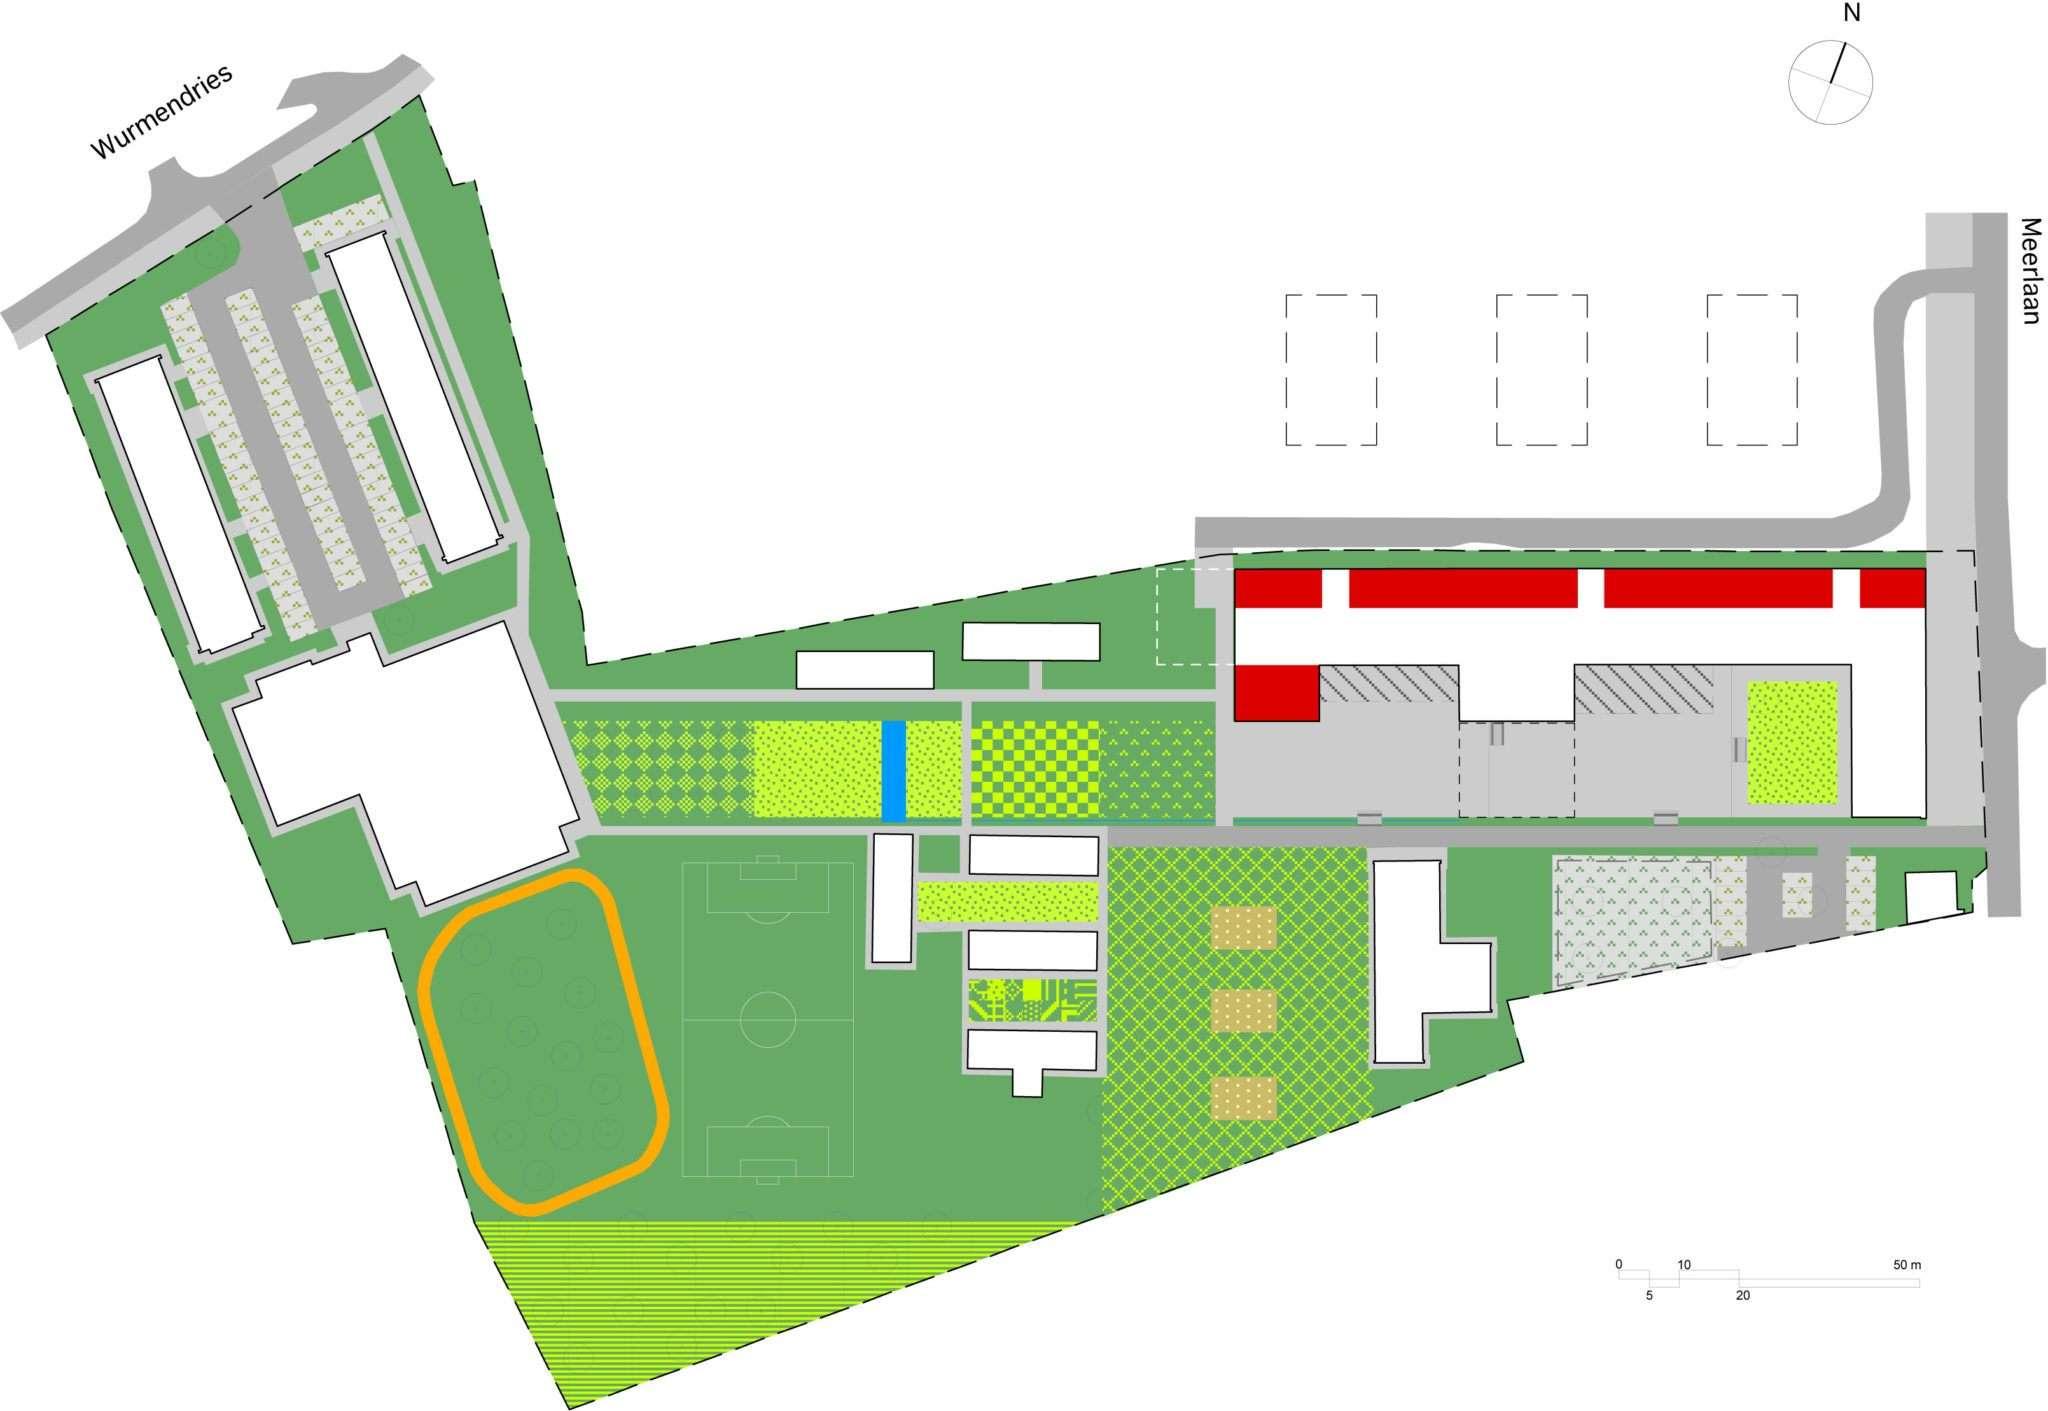 koninklijk atheneum zottegem <span>2014, zottegem, kaz, school</span>